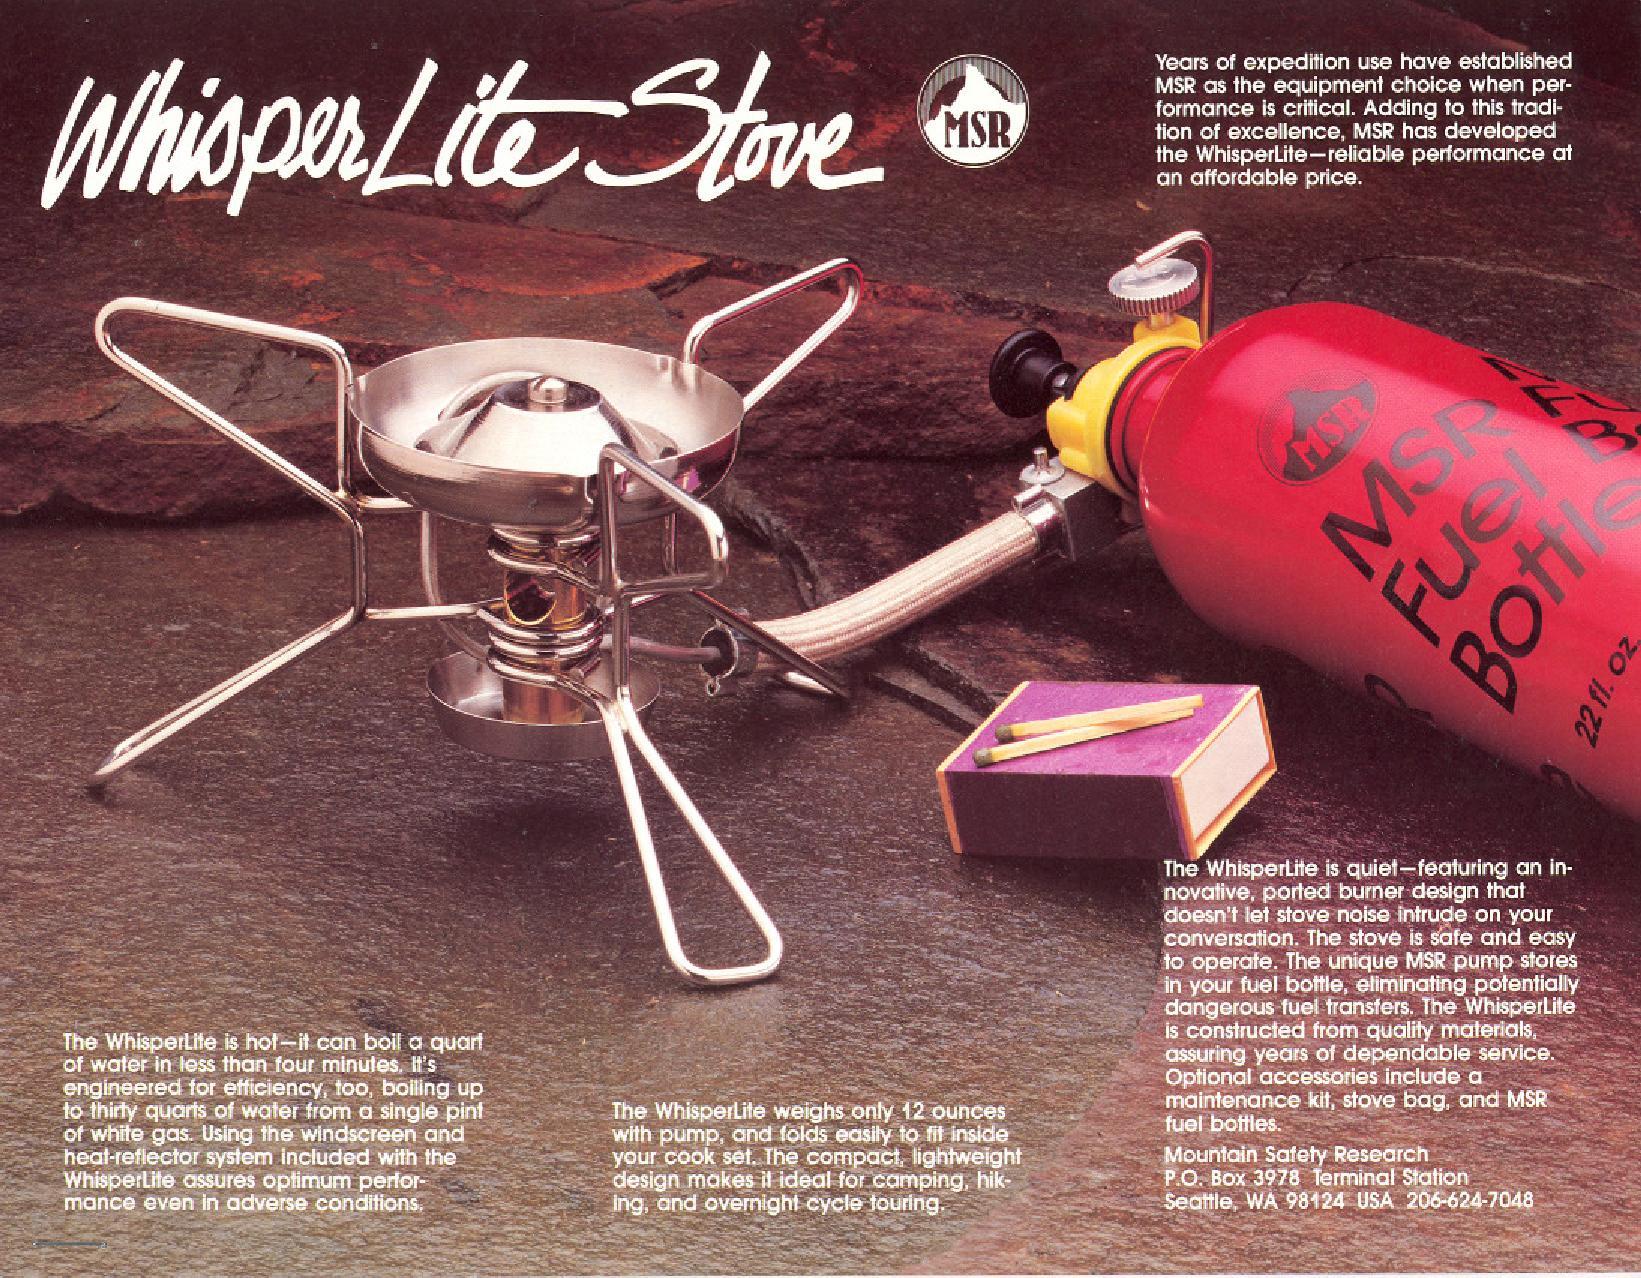 MSR WhisterLite stove 1984